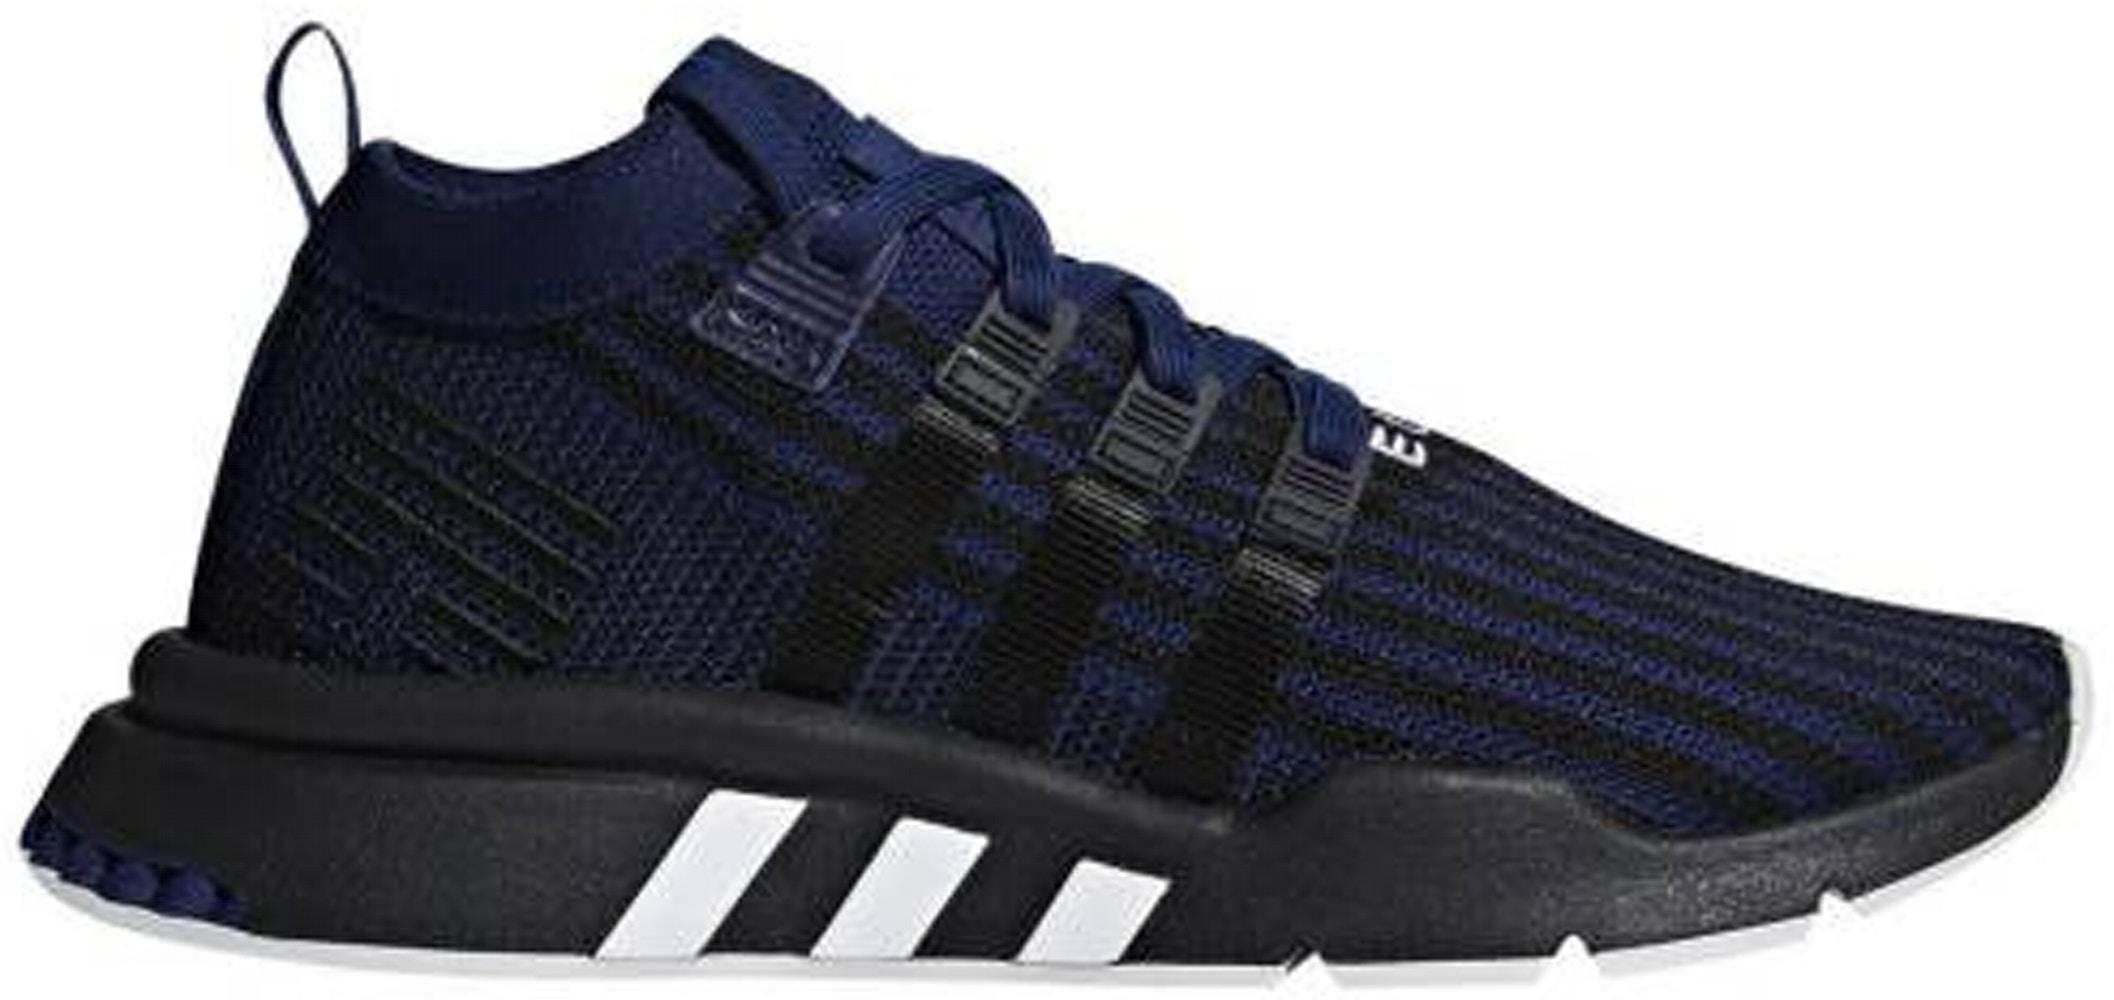 adidas EQT Support Mid Adv Blue Core Black - B37512